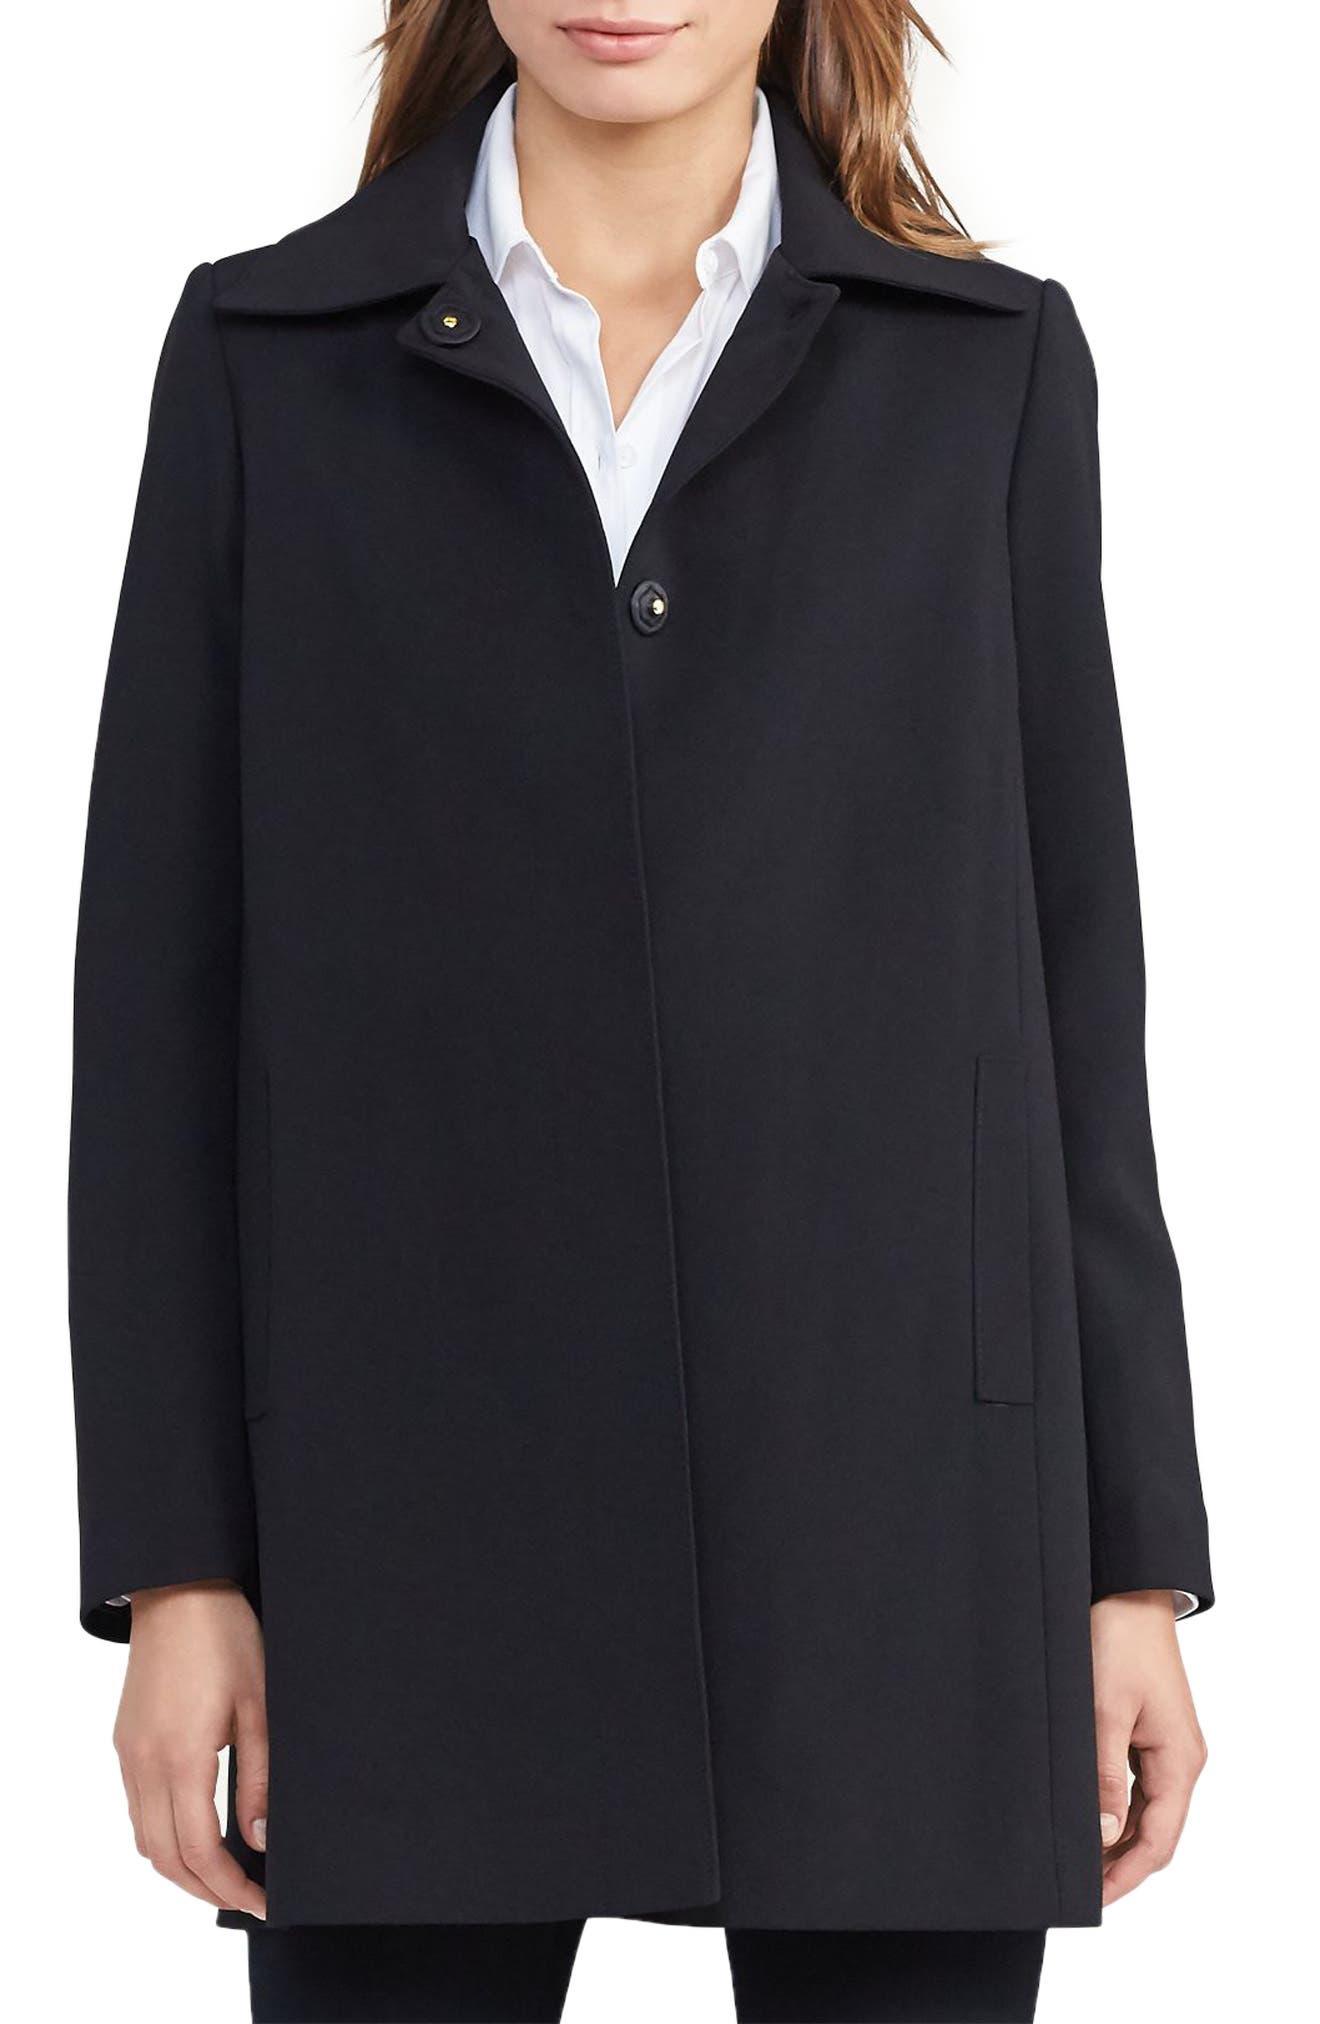 Crepe Jacket,                         Main,                         color, Black